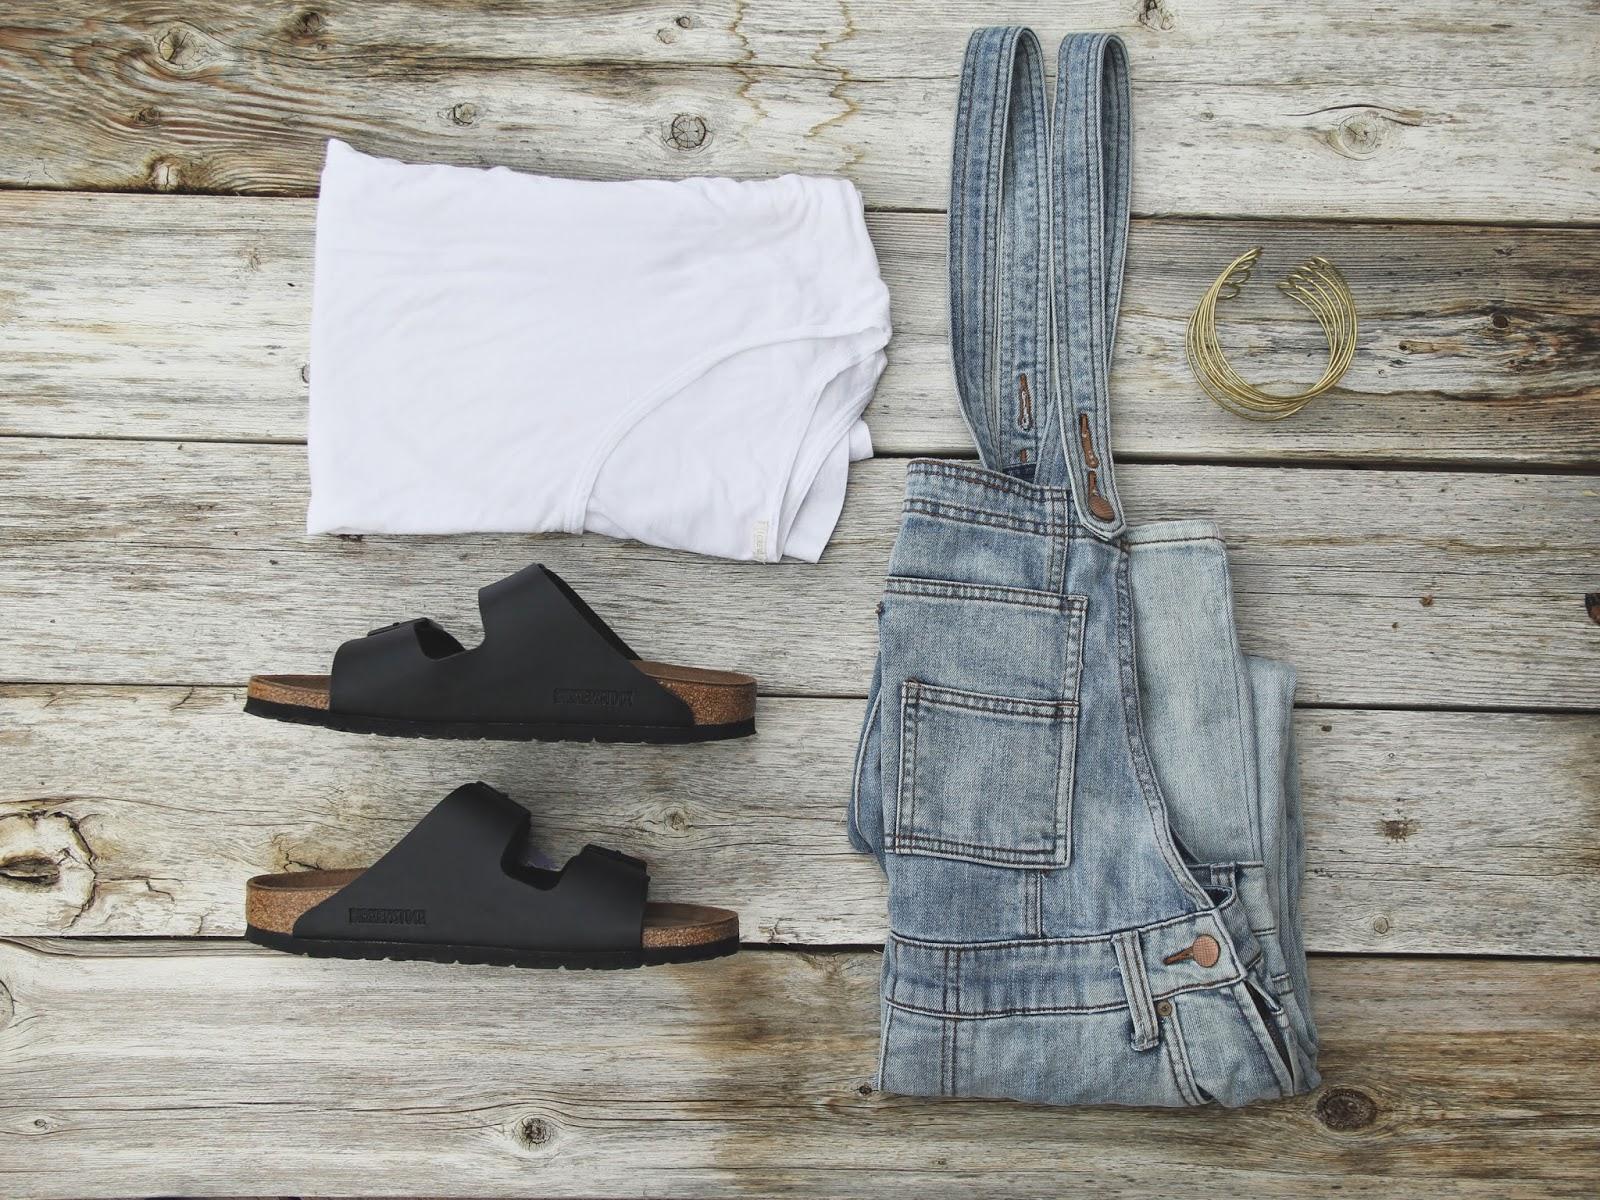 Overalls, Birkenstocks, Arm Cuff, White shirt